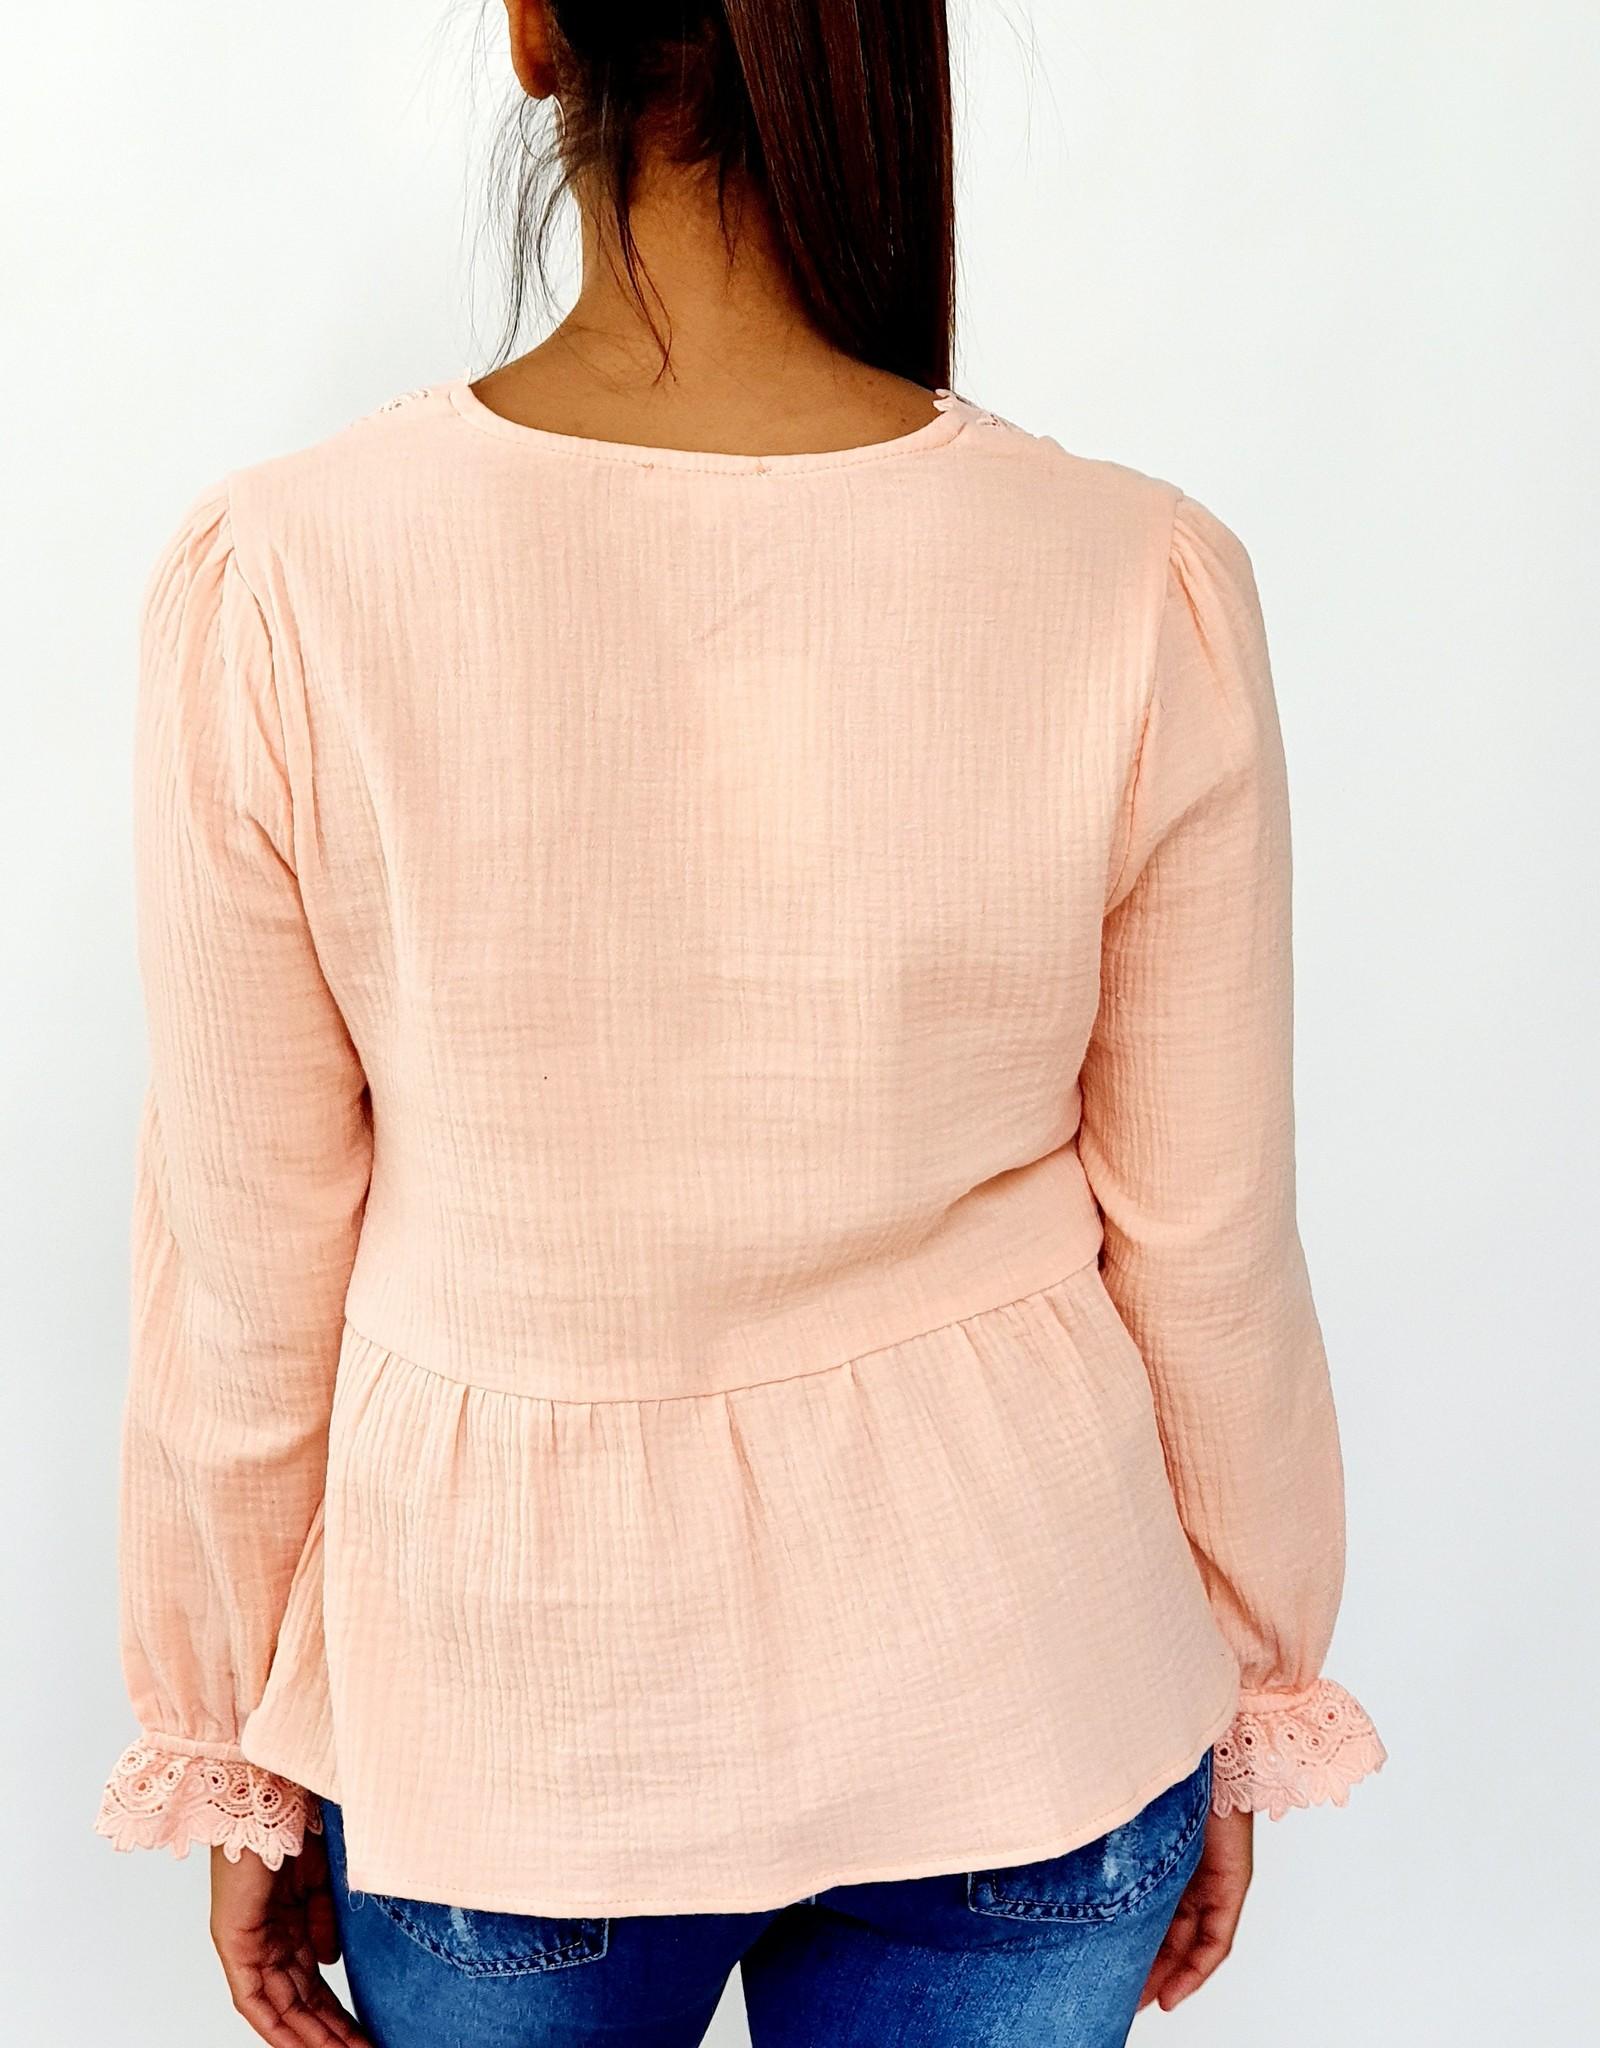 Soft blouse